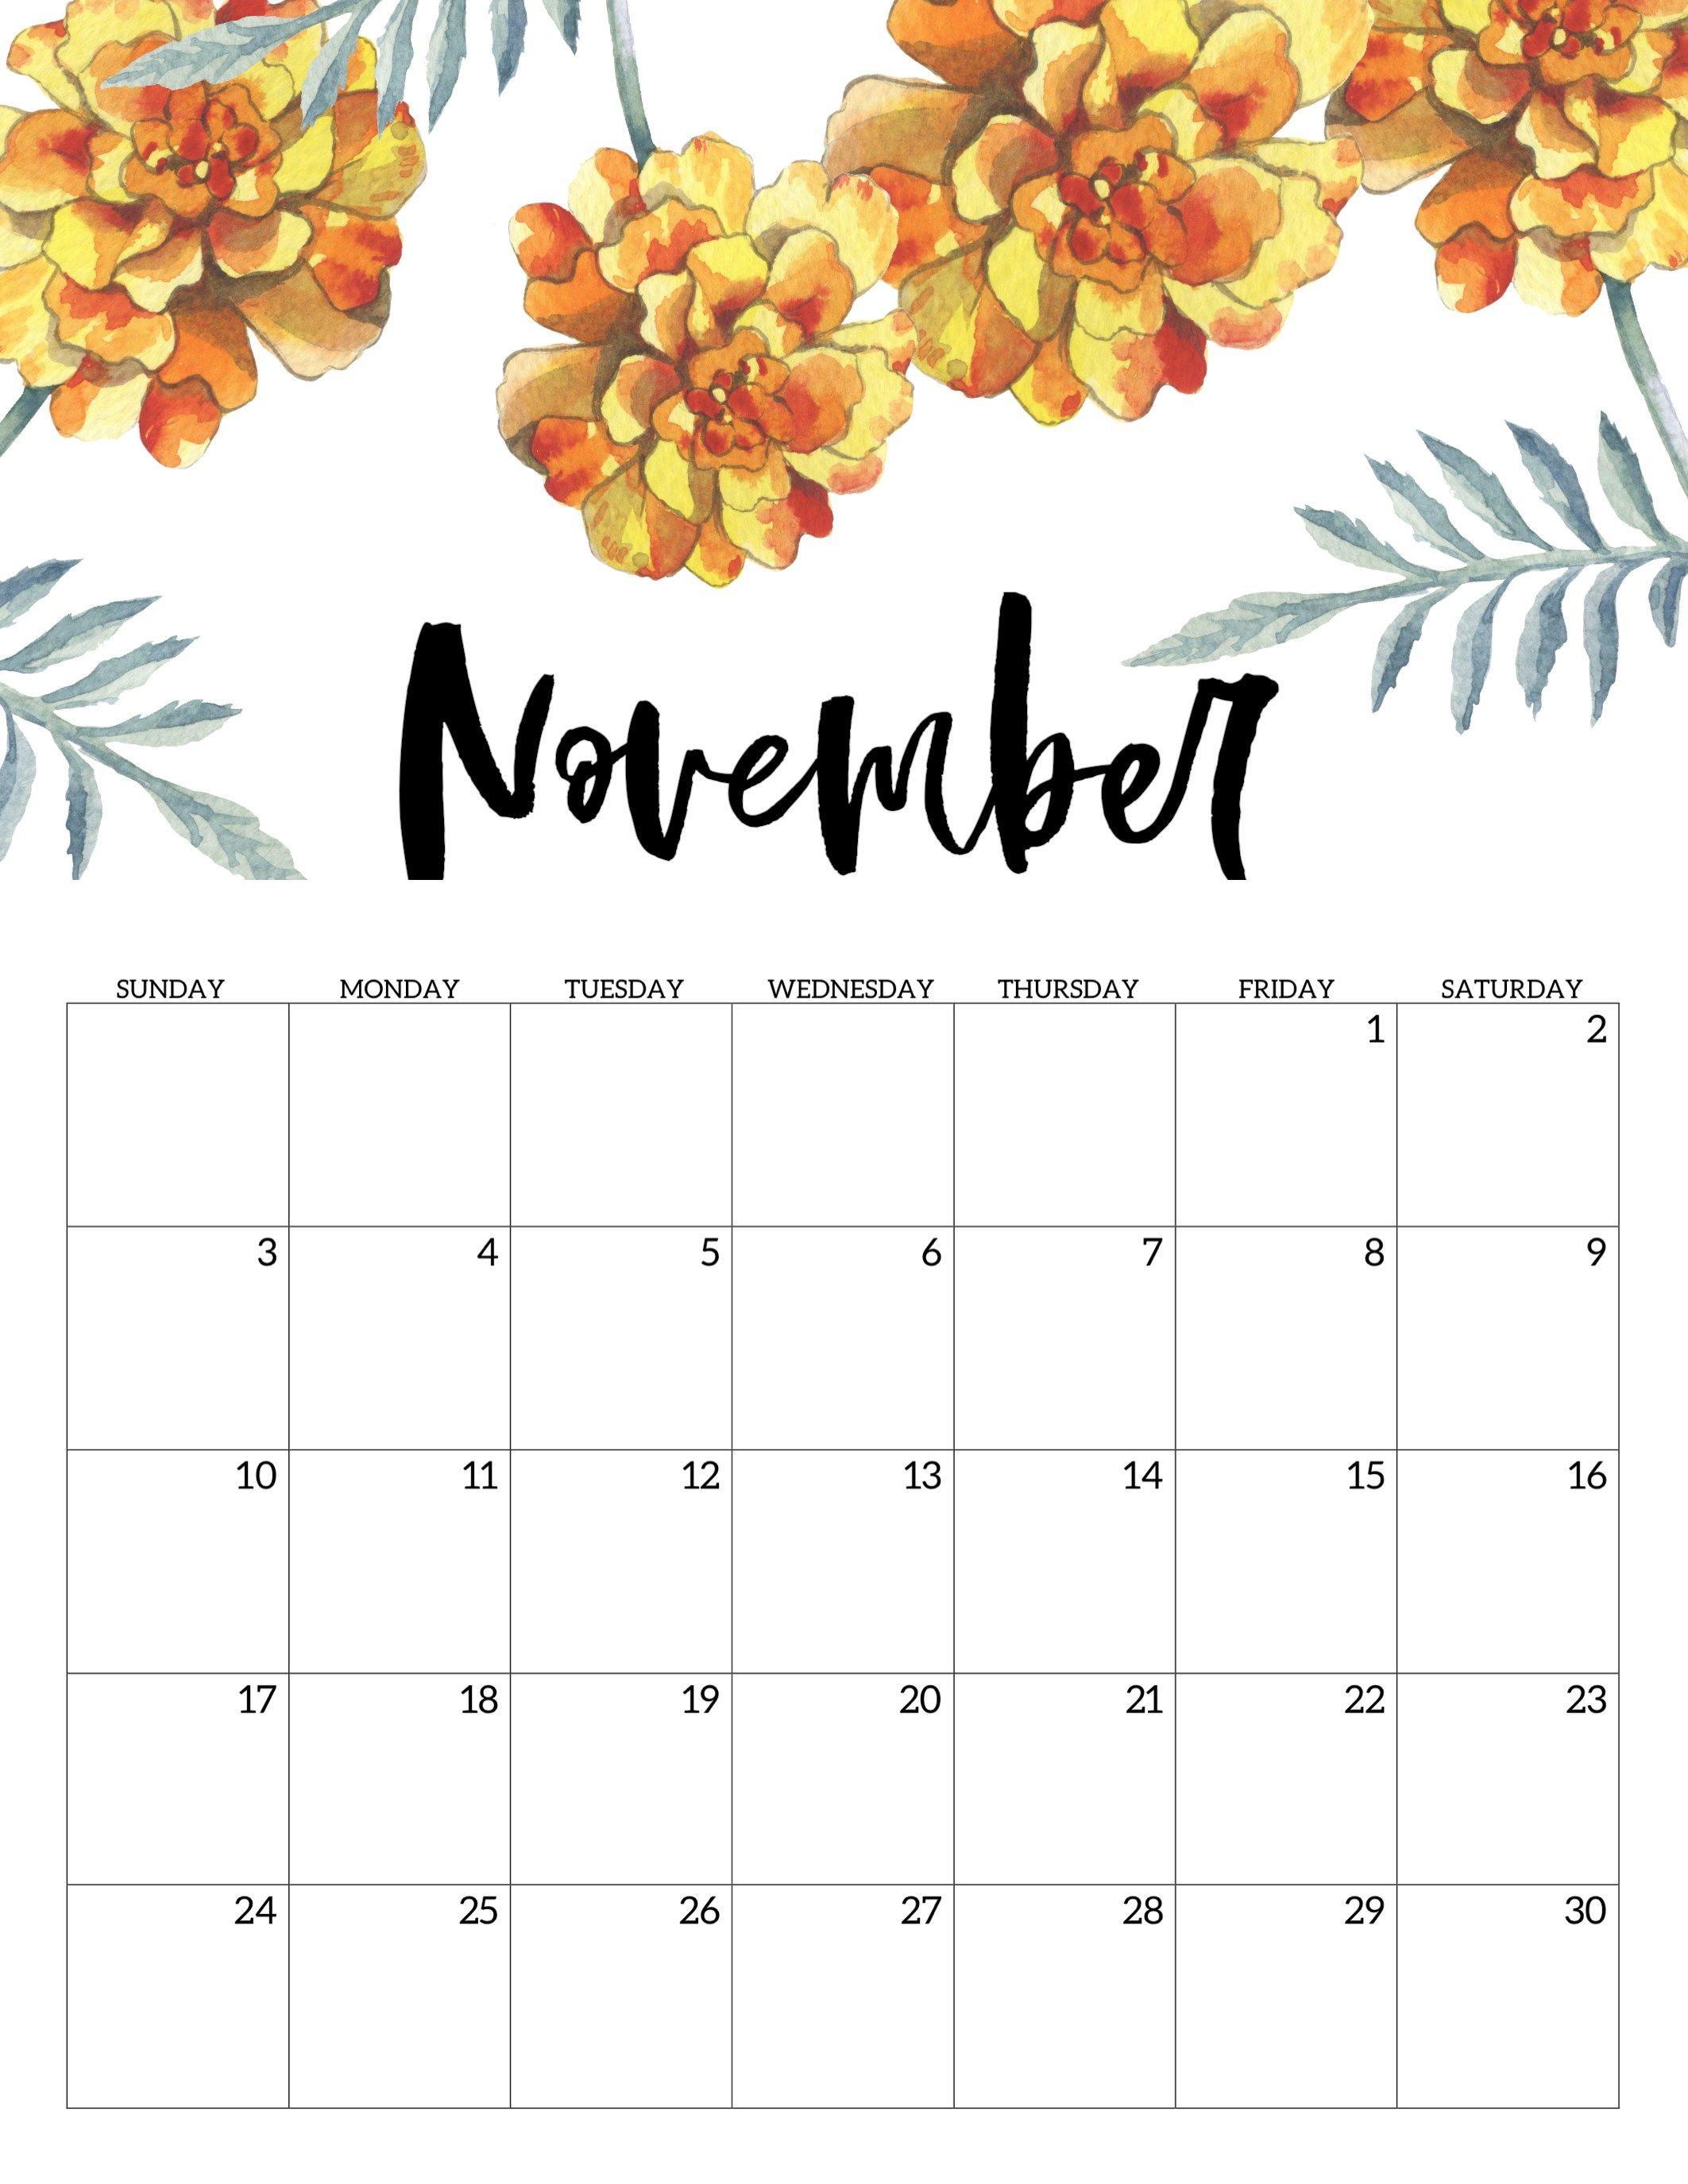 Free Printable Calendar 2019 - Floral | Free printable ...